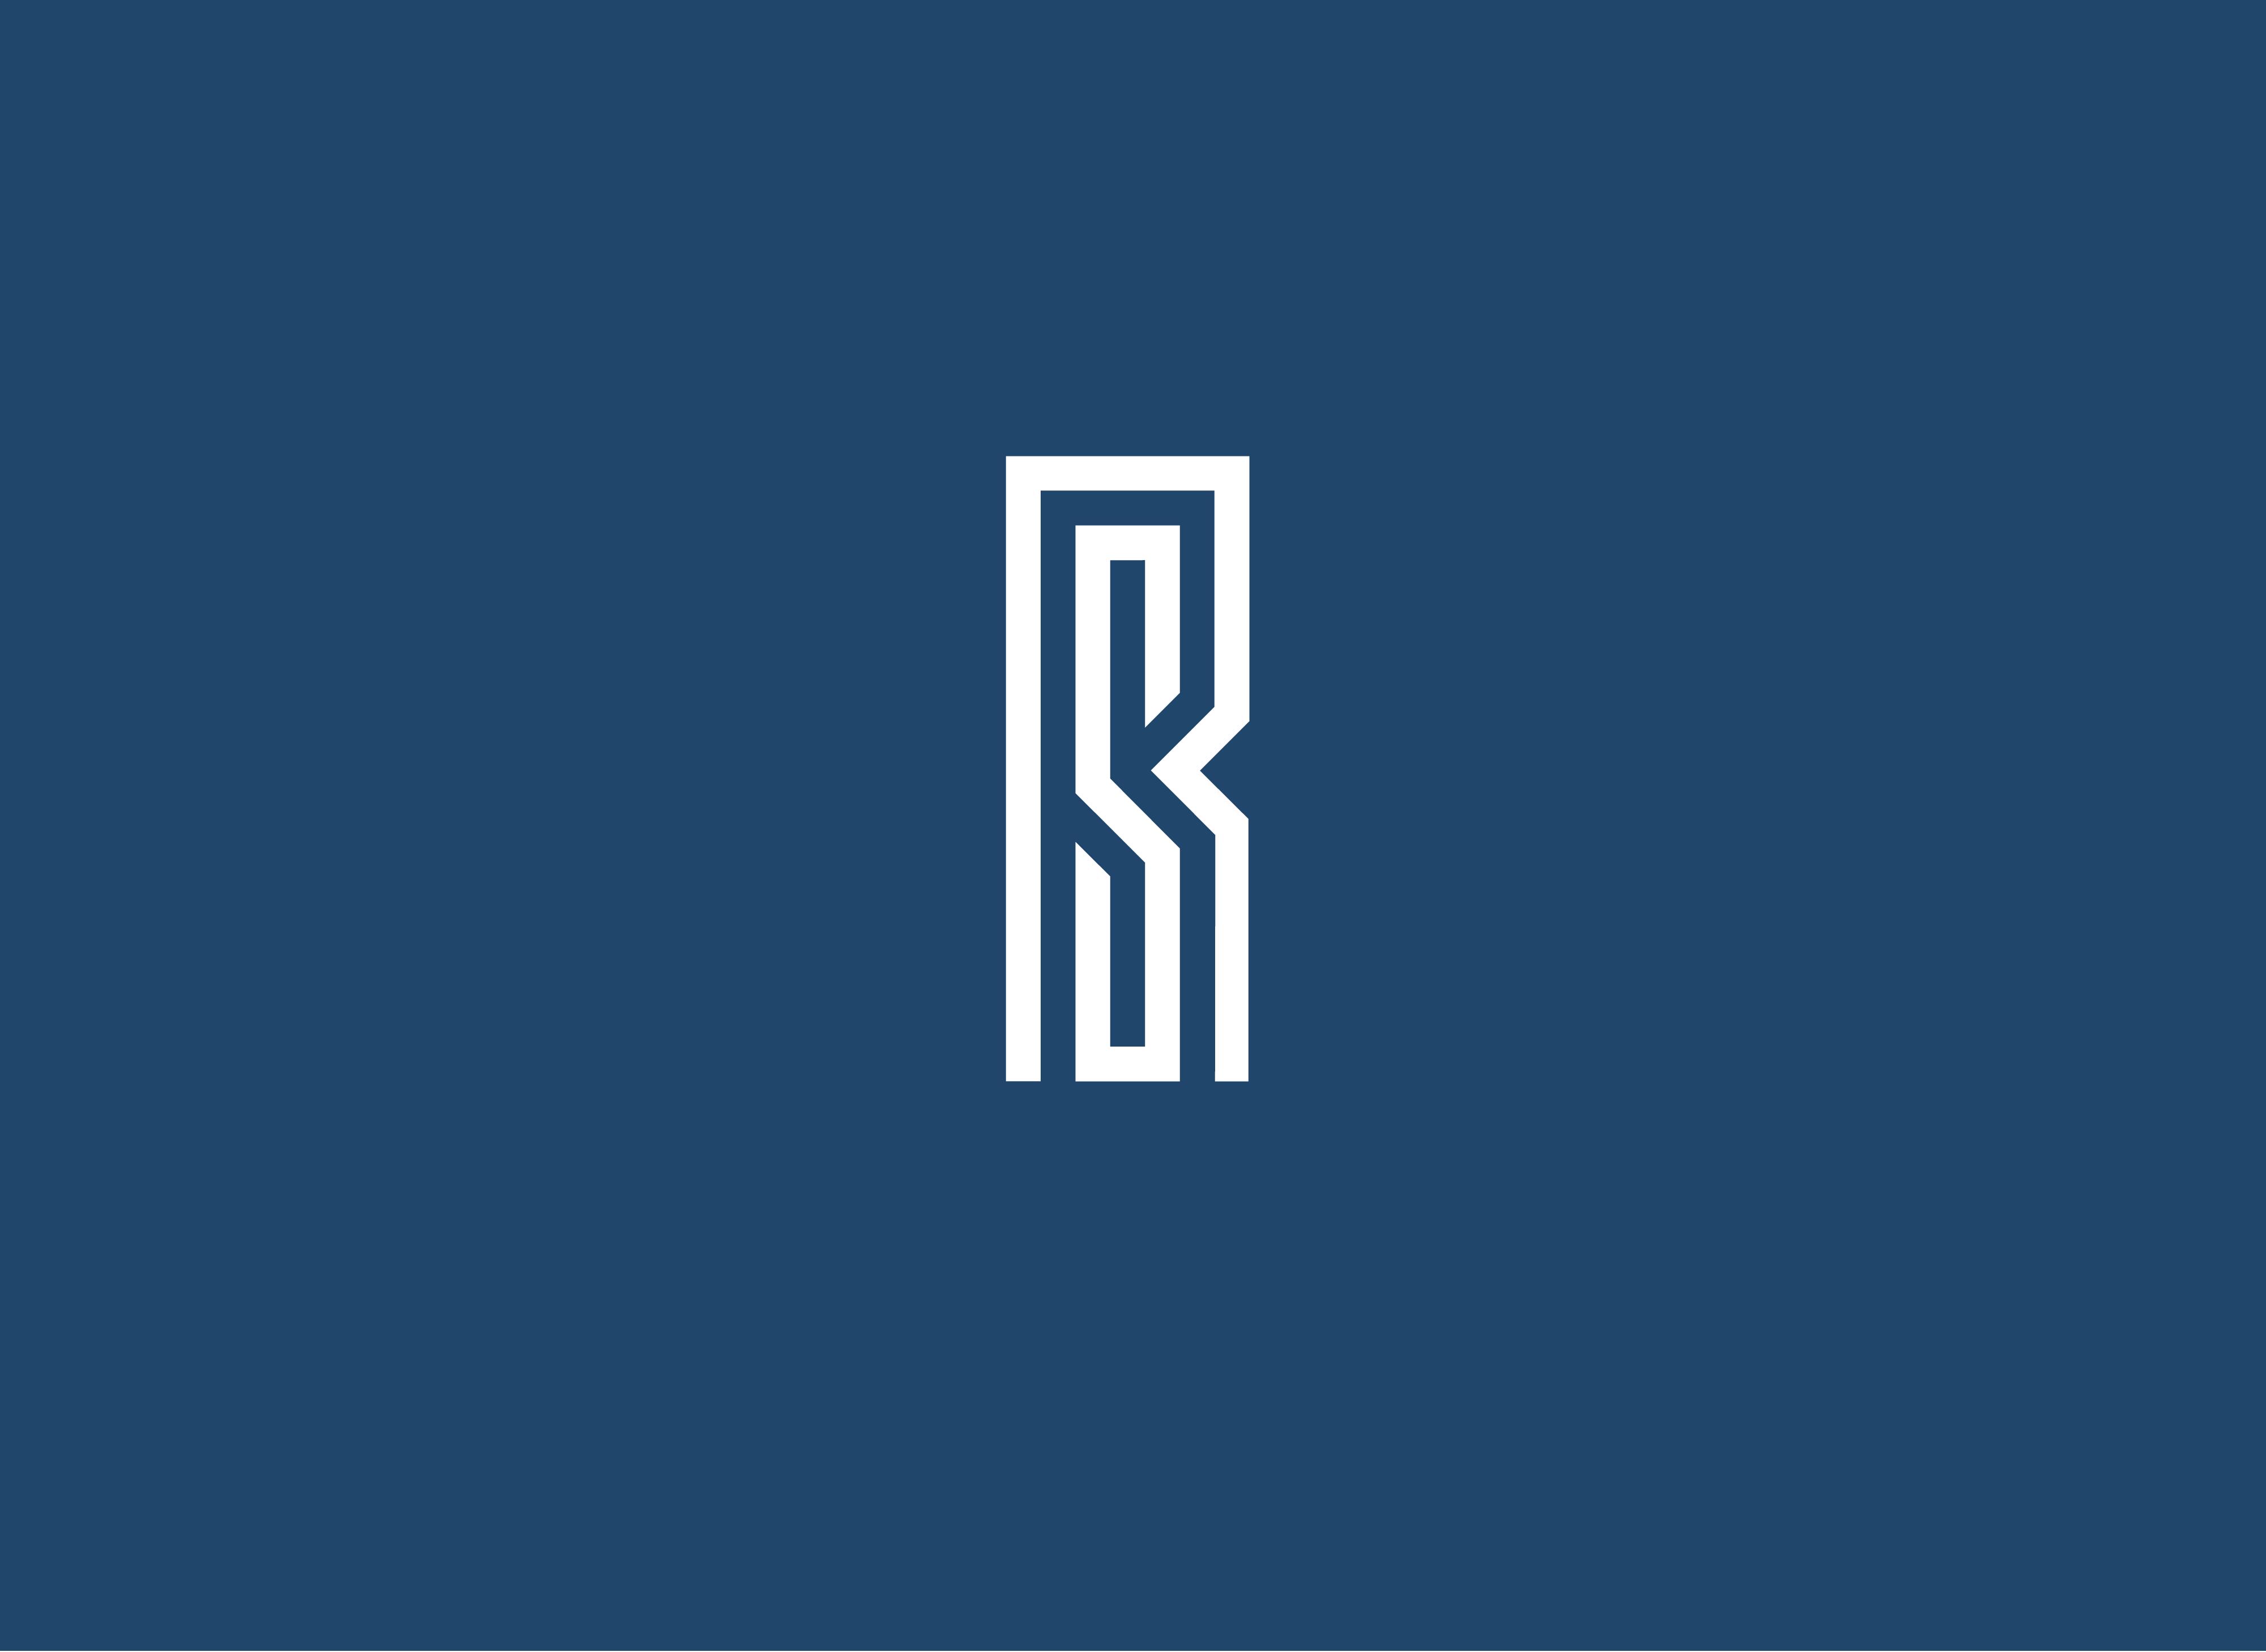 Rodriguez_Sandoval_mark-02